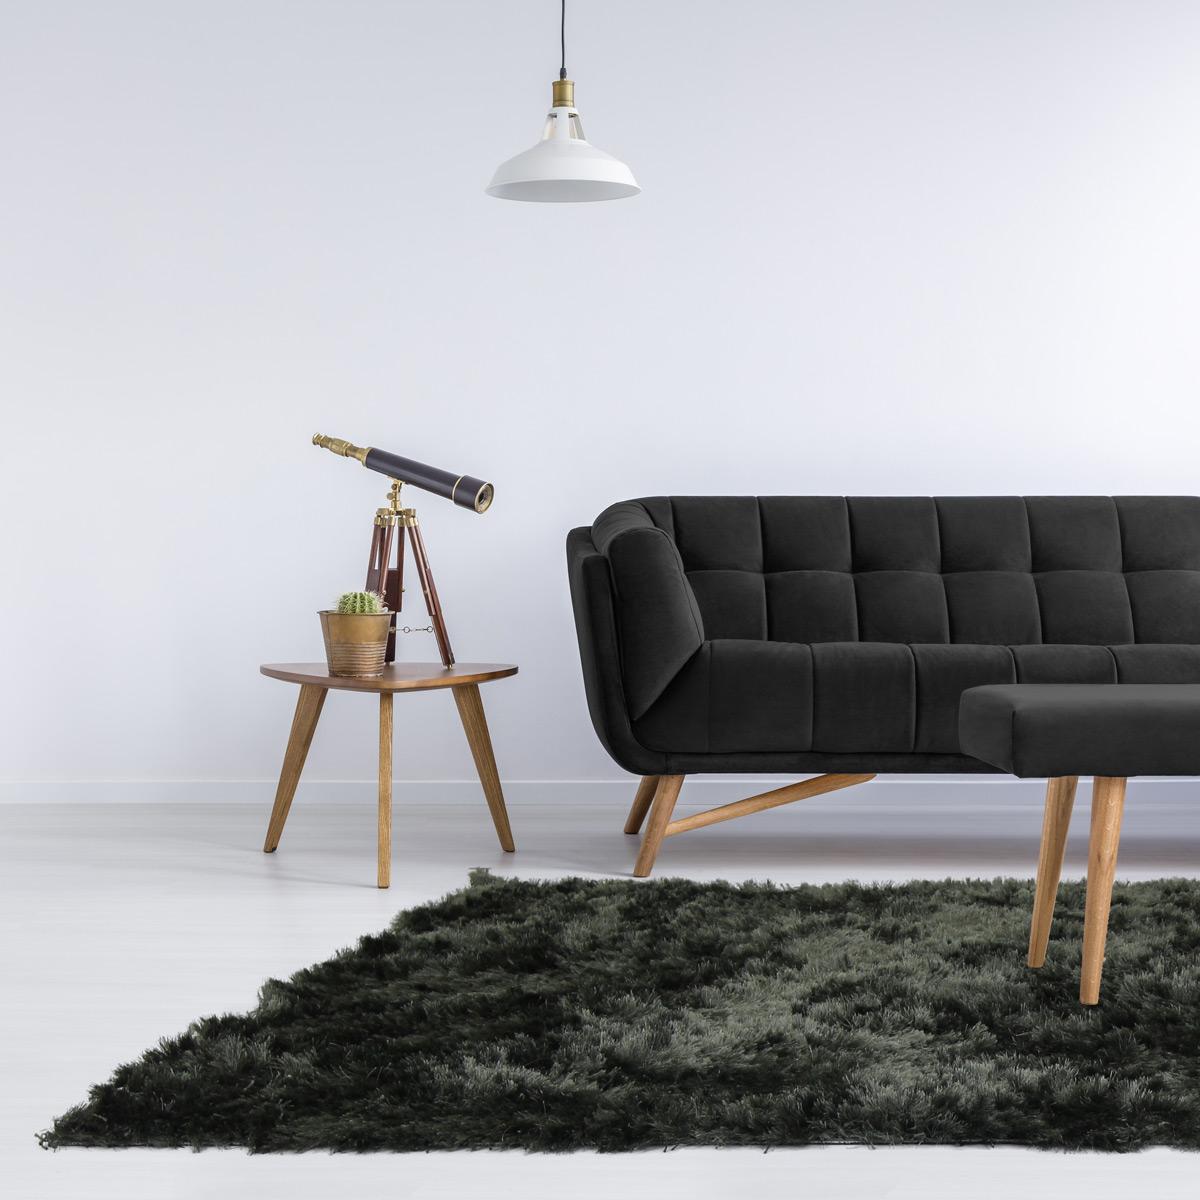 Vloerkleed Xilento Magnifique Classic Green | 170 x 230 cm